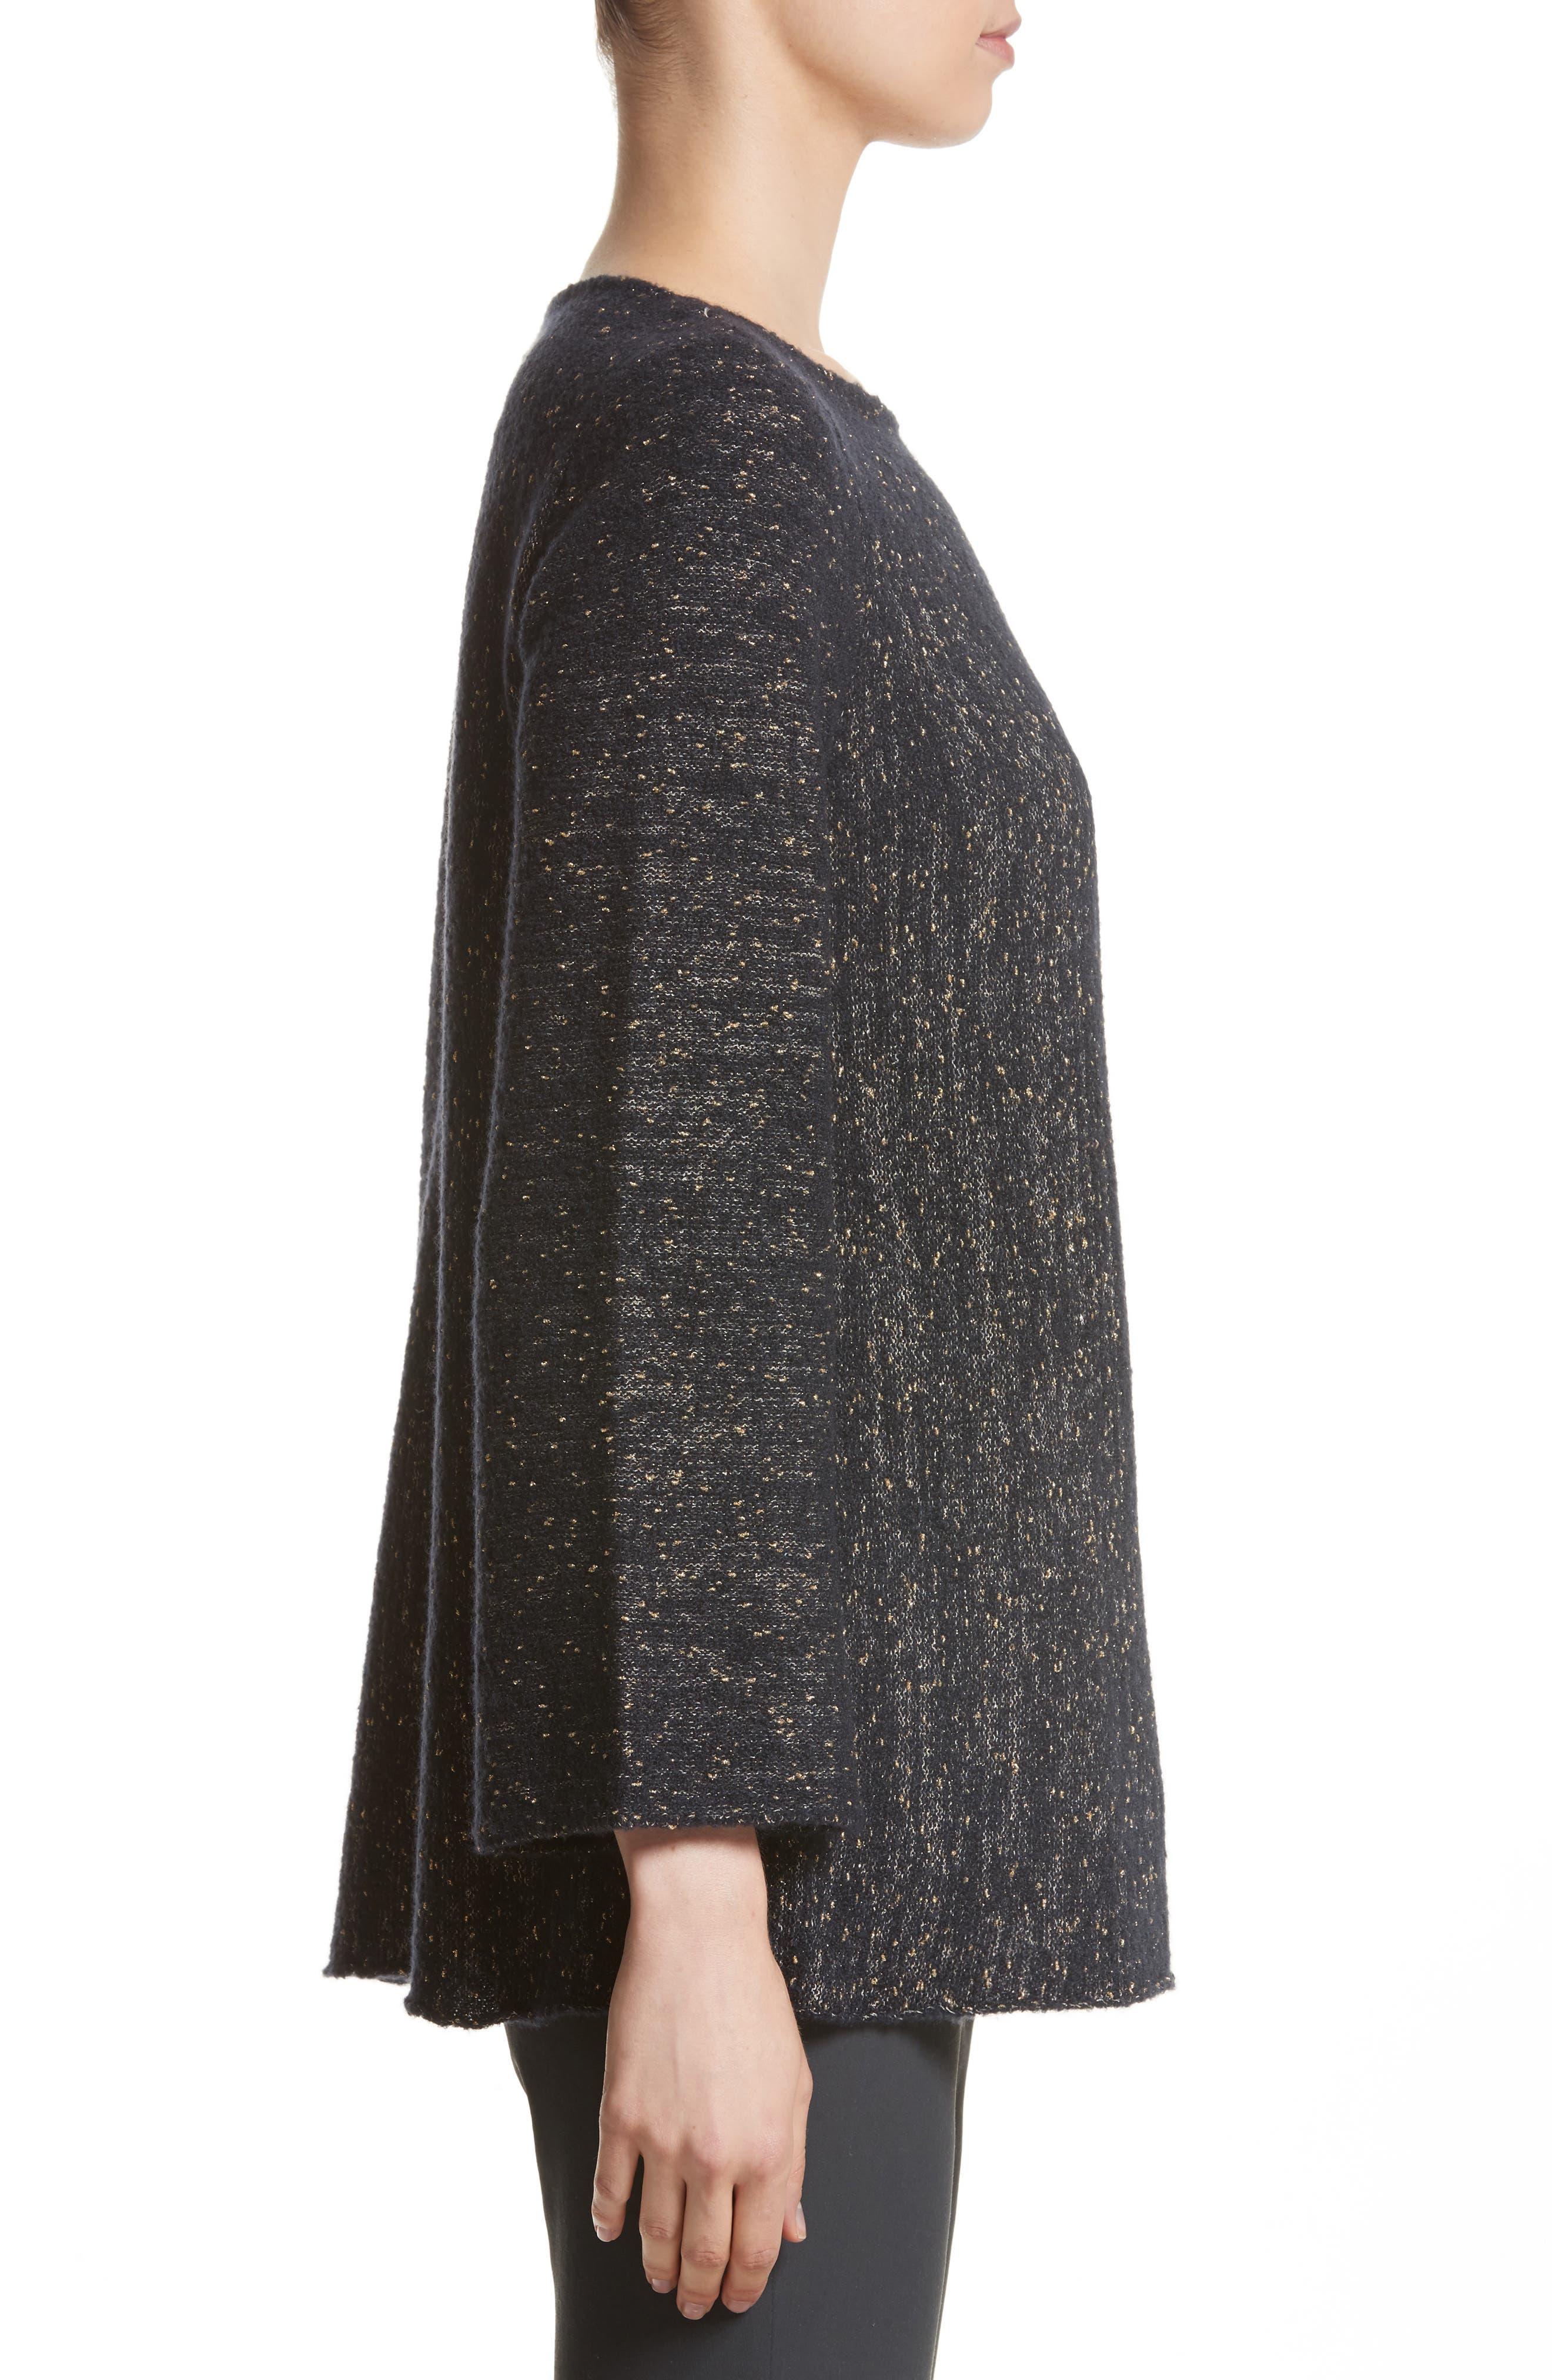 Lafayette Metallic Knit A-Line Sweater,                             Alternate thumbnail 3, color,                             Ink Metallic